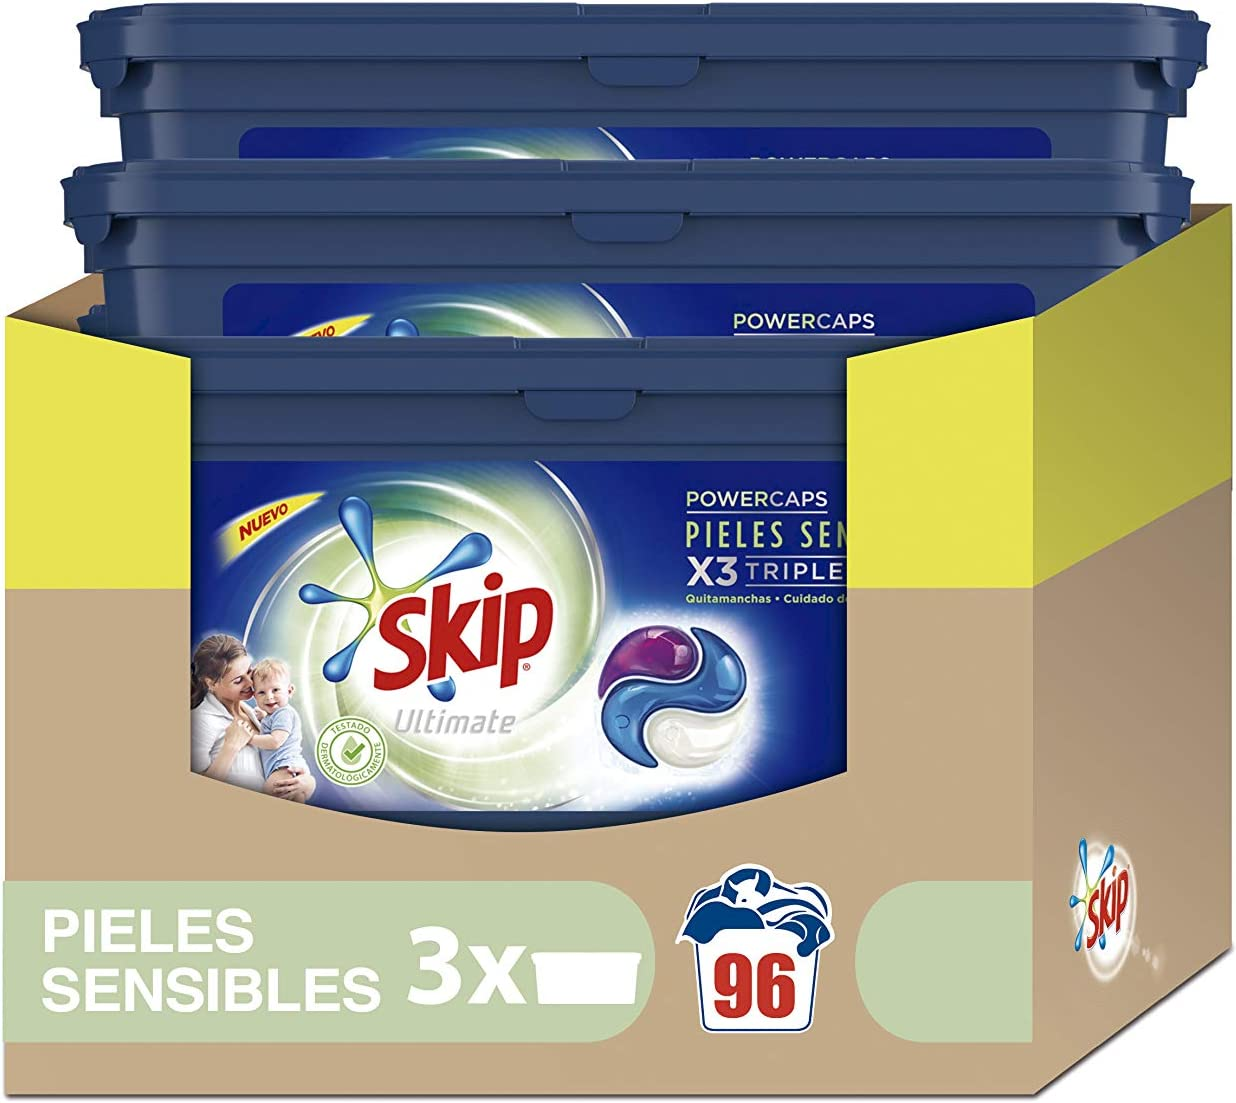 Skip Ultimate Triple Poder Pieles Sensibles Detergente Cápsulas para Lavadora - Paquete de 3 x 32 lavados - Total: 96 lavados